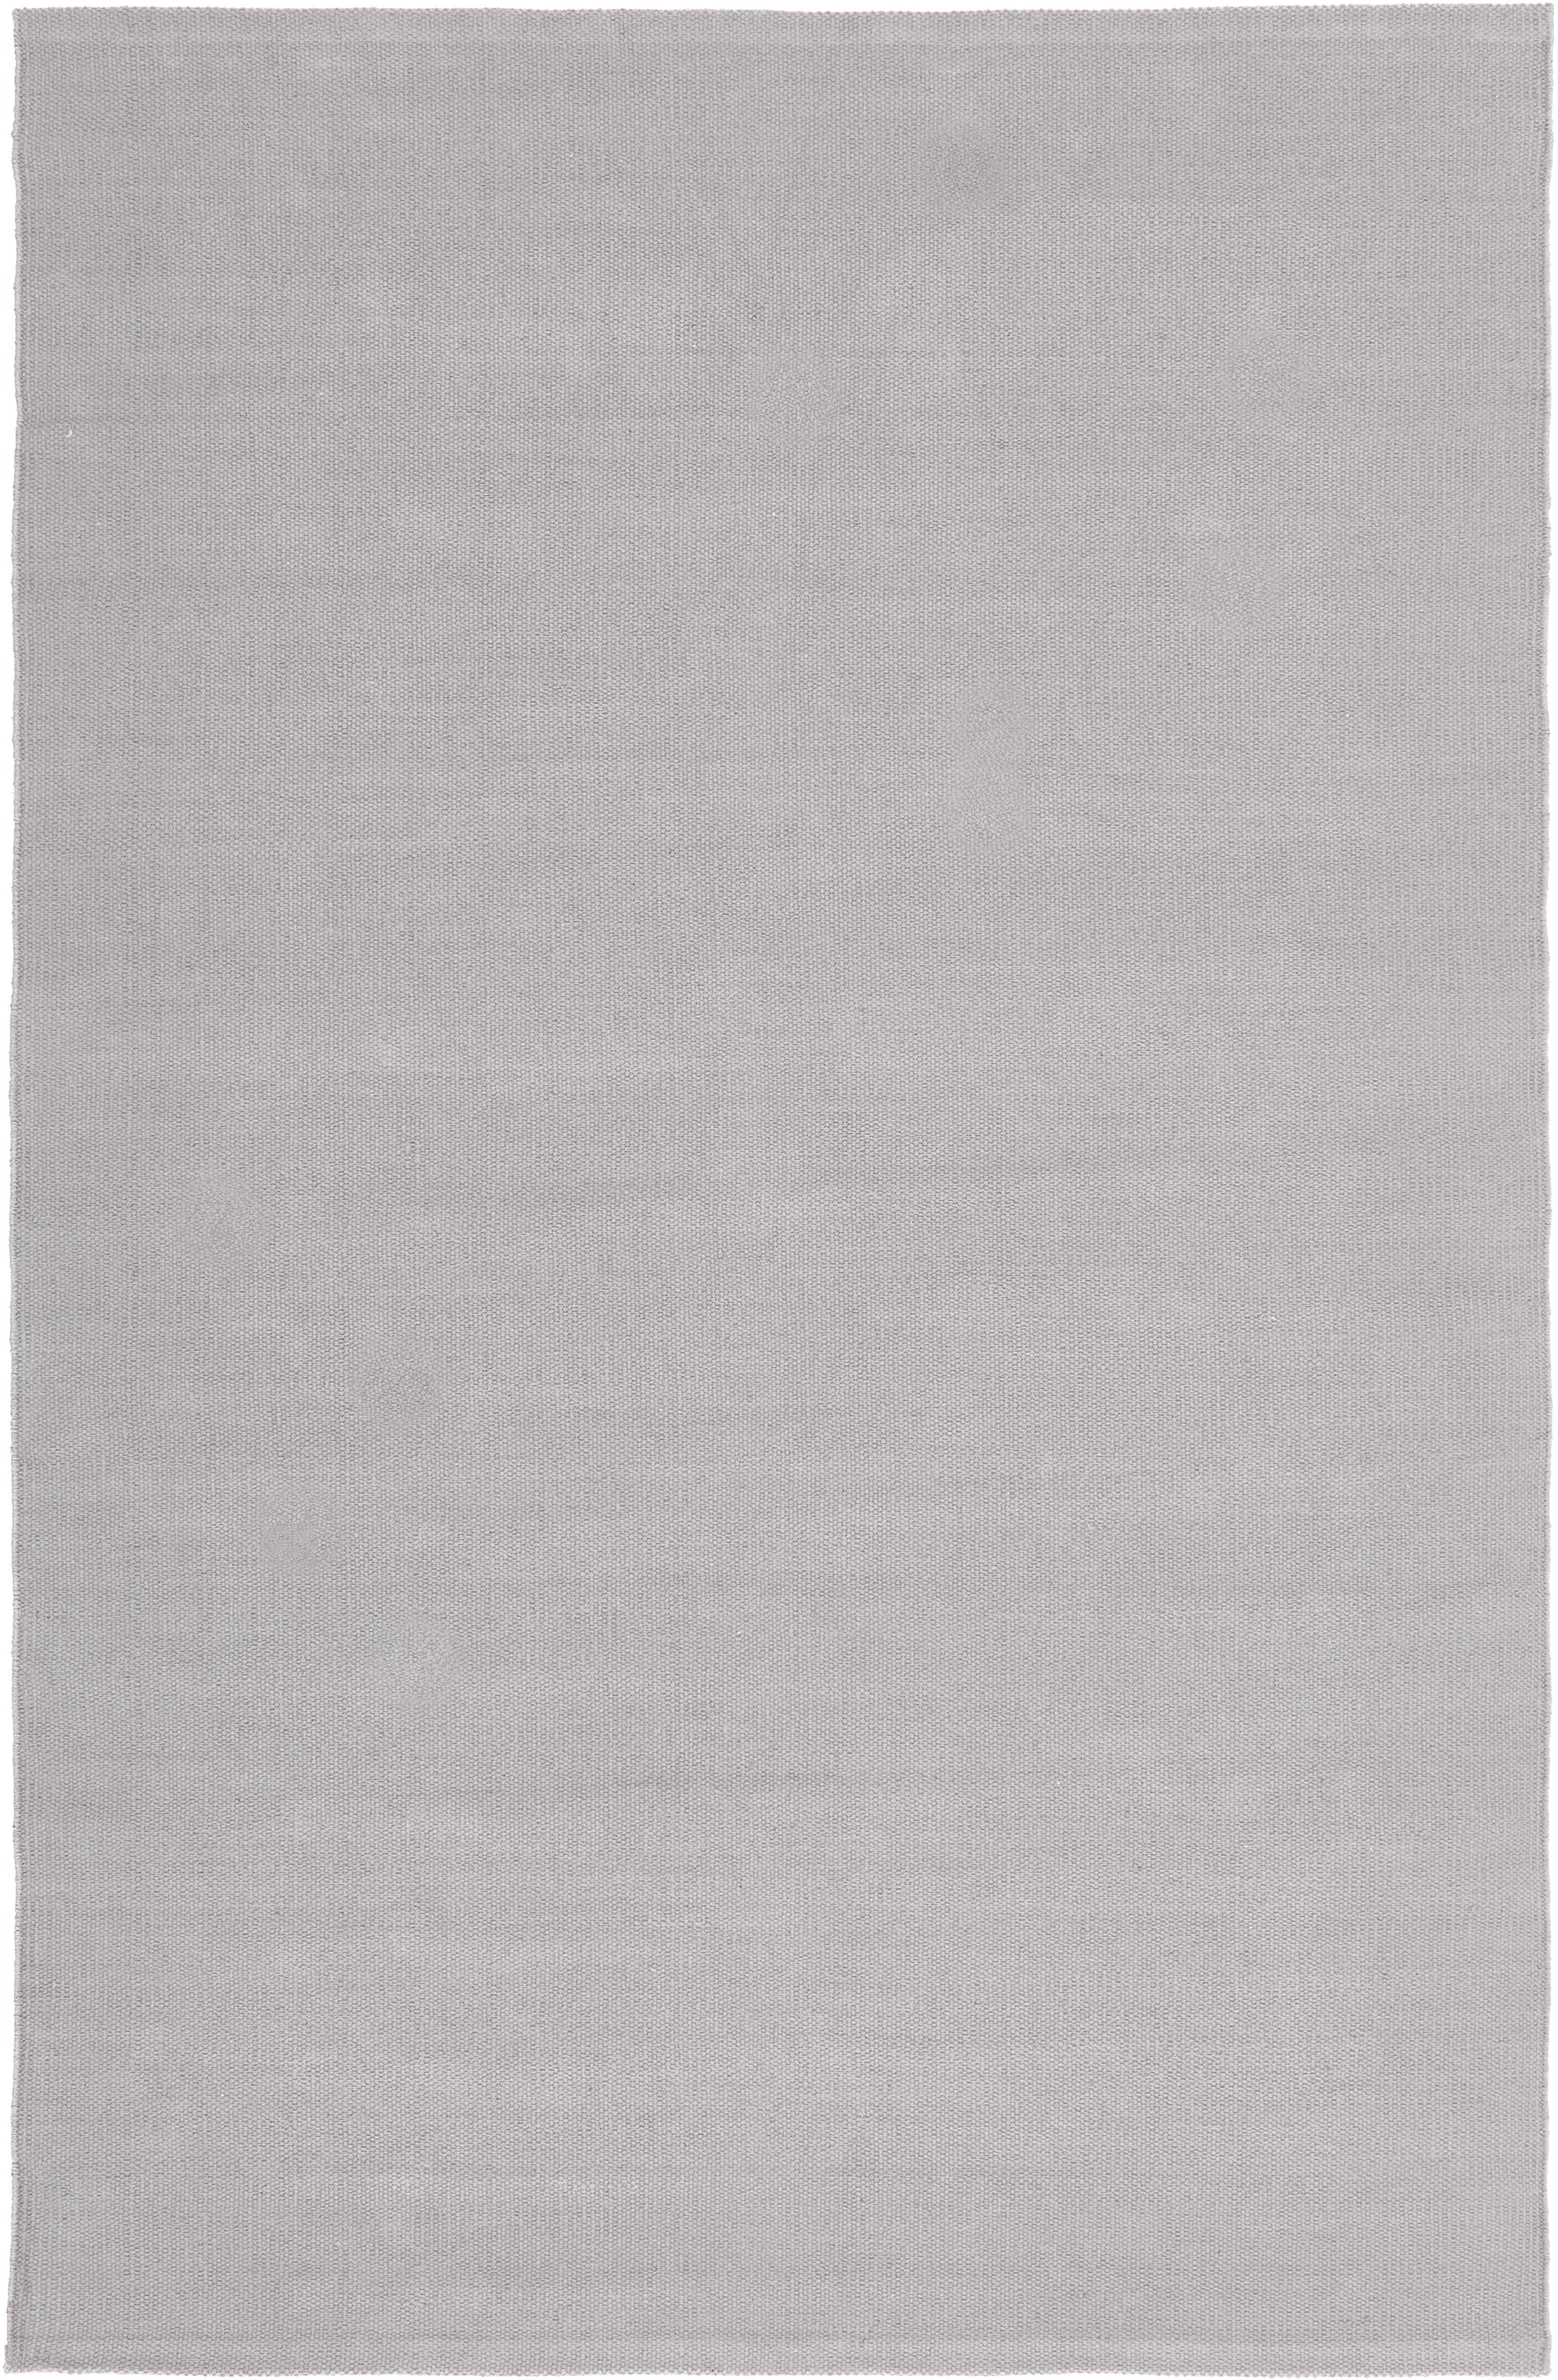 Alfombra artesanal de algodón Agneta, 100%algodón, Gris, An 120 x L 180  cm(Tamaño S)